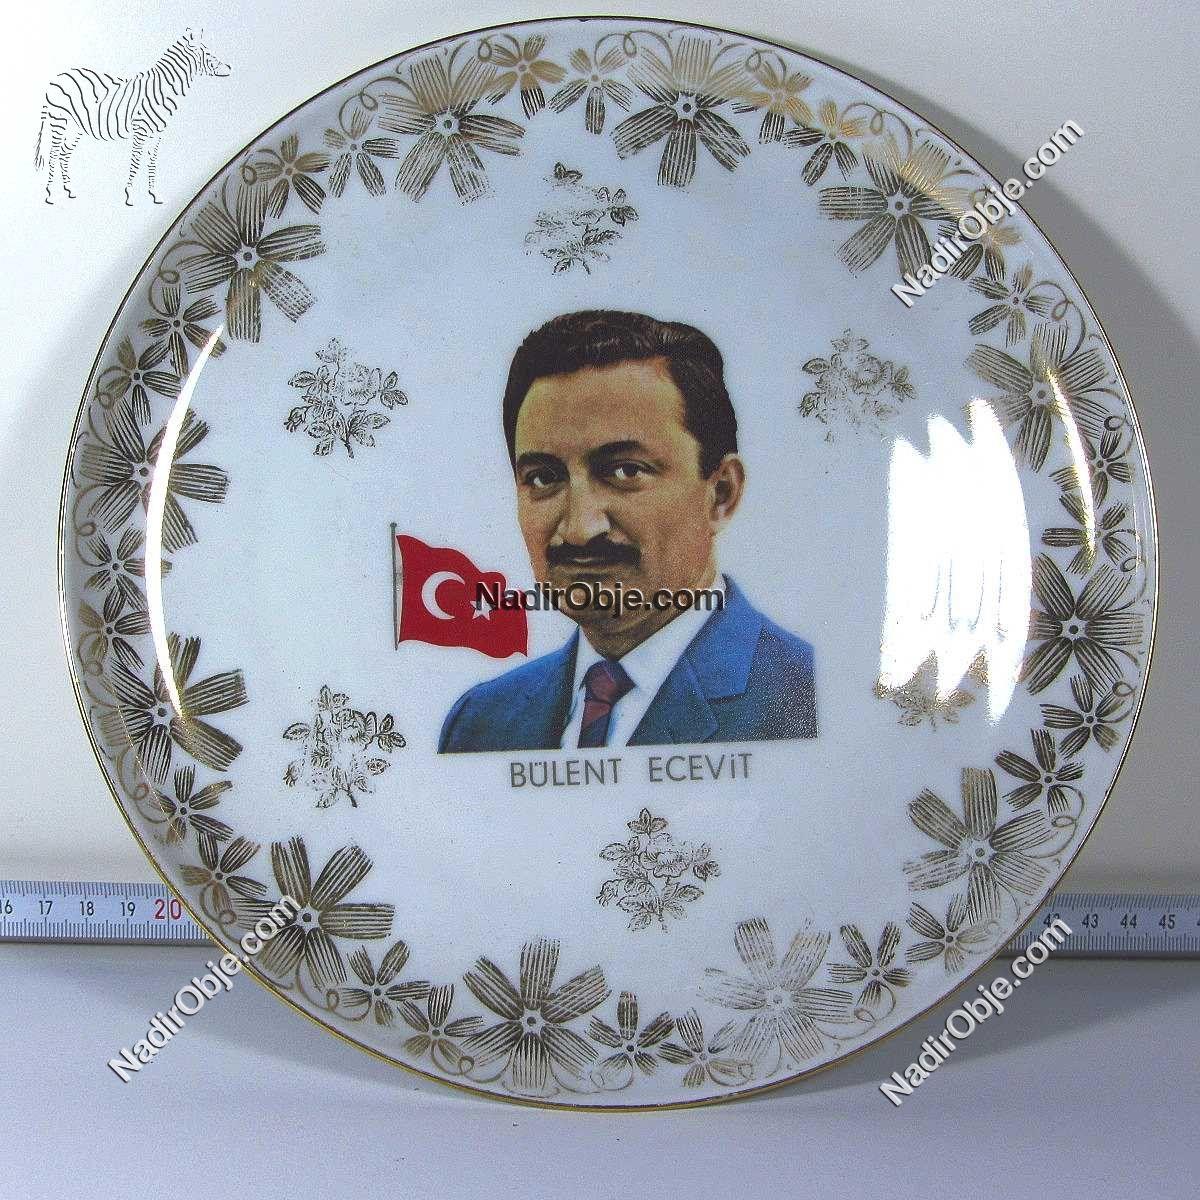 Bülent Ecevit Porselen Tabak Seramik-Porselen Objeler Bülent Ecevit